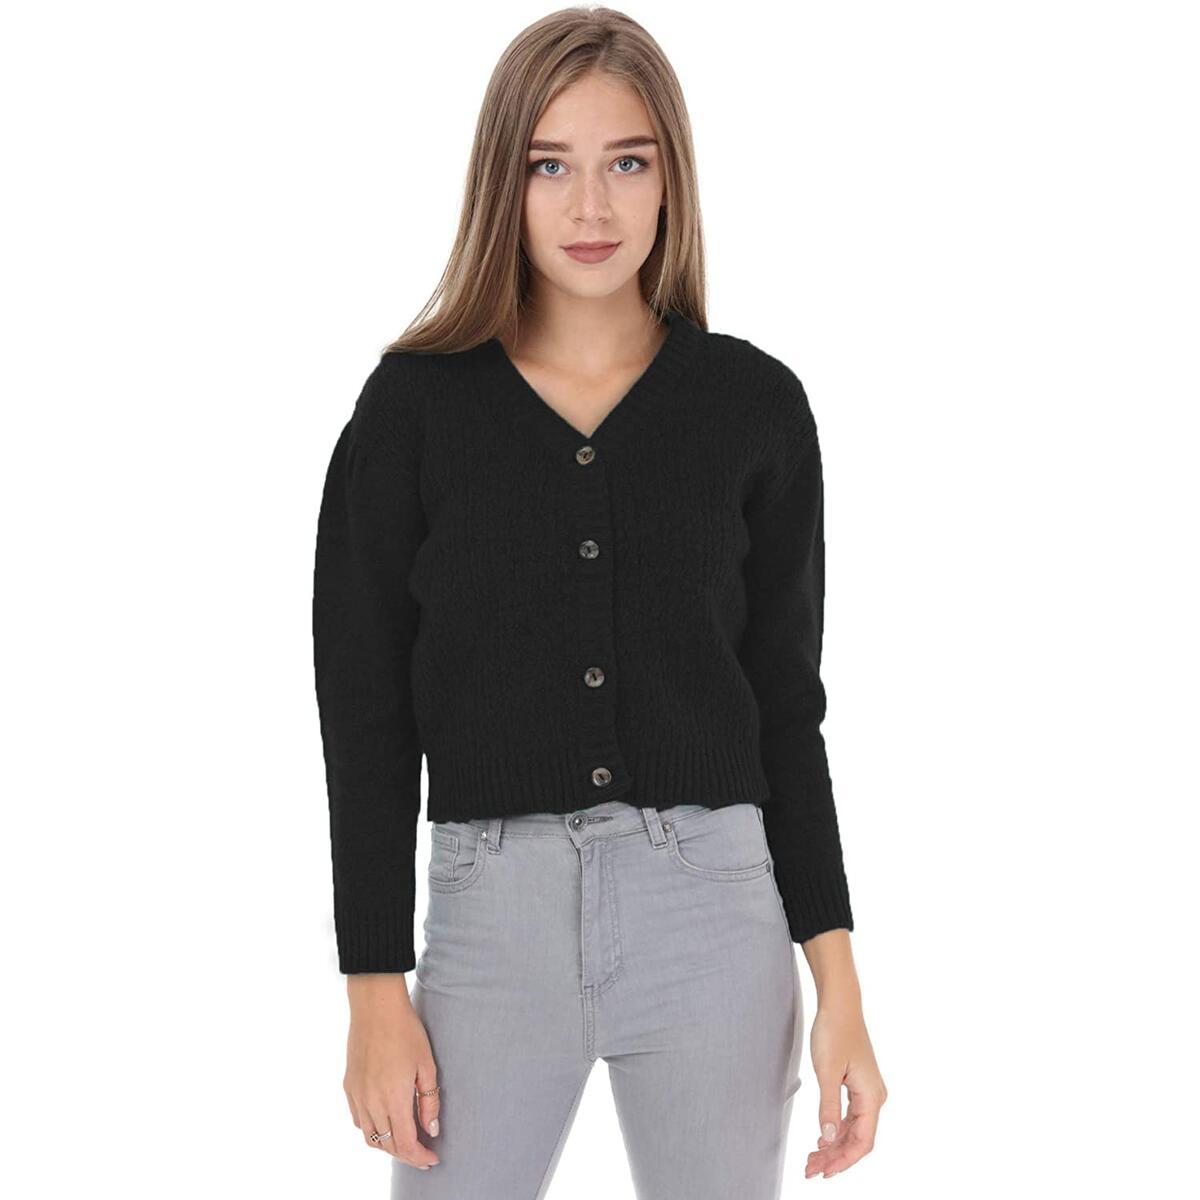 beneliza Womens Cardigans, Cardigan Sweater Crop Top Button Down Two Piece Set